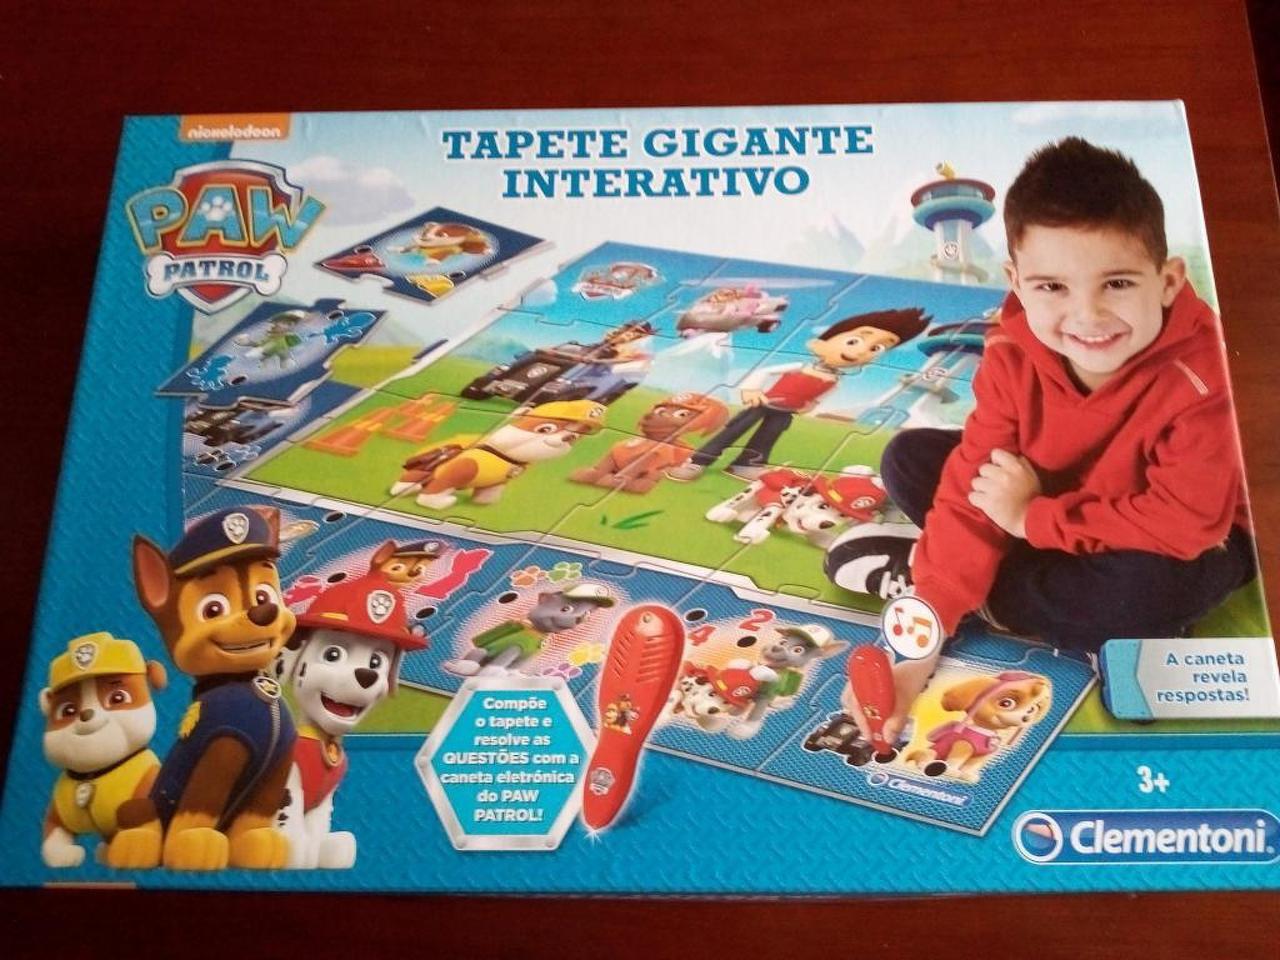 Tapete Gigante Iterativo Paw Patrol / Patrulha Pata, 3+Anos. Novo - 1/4